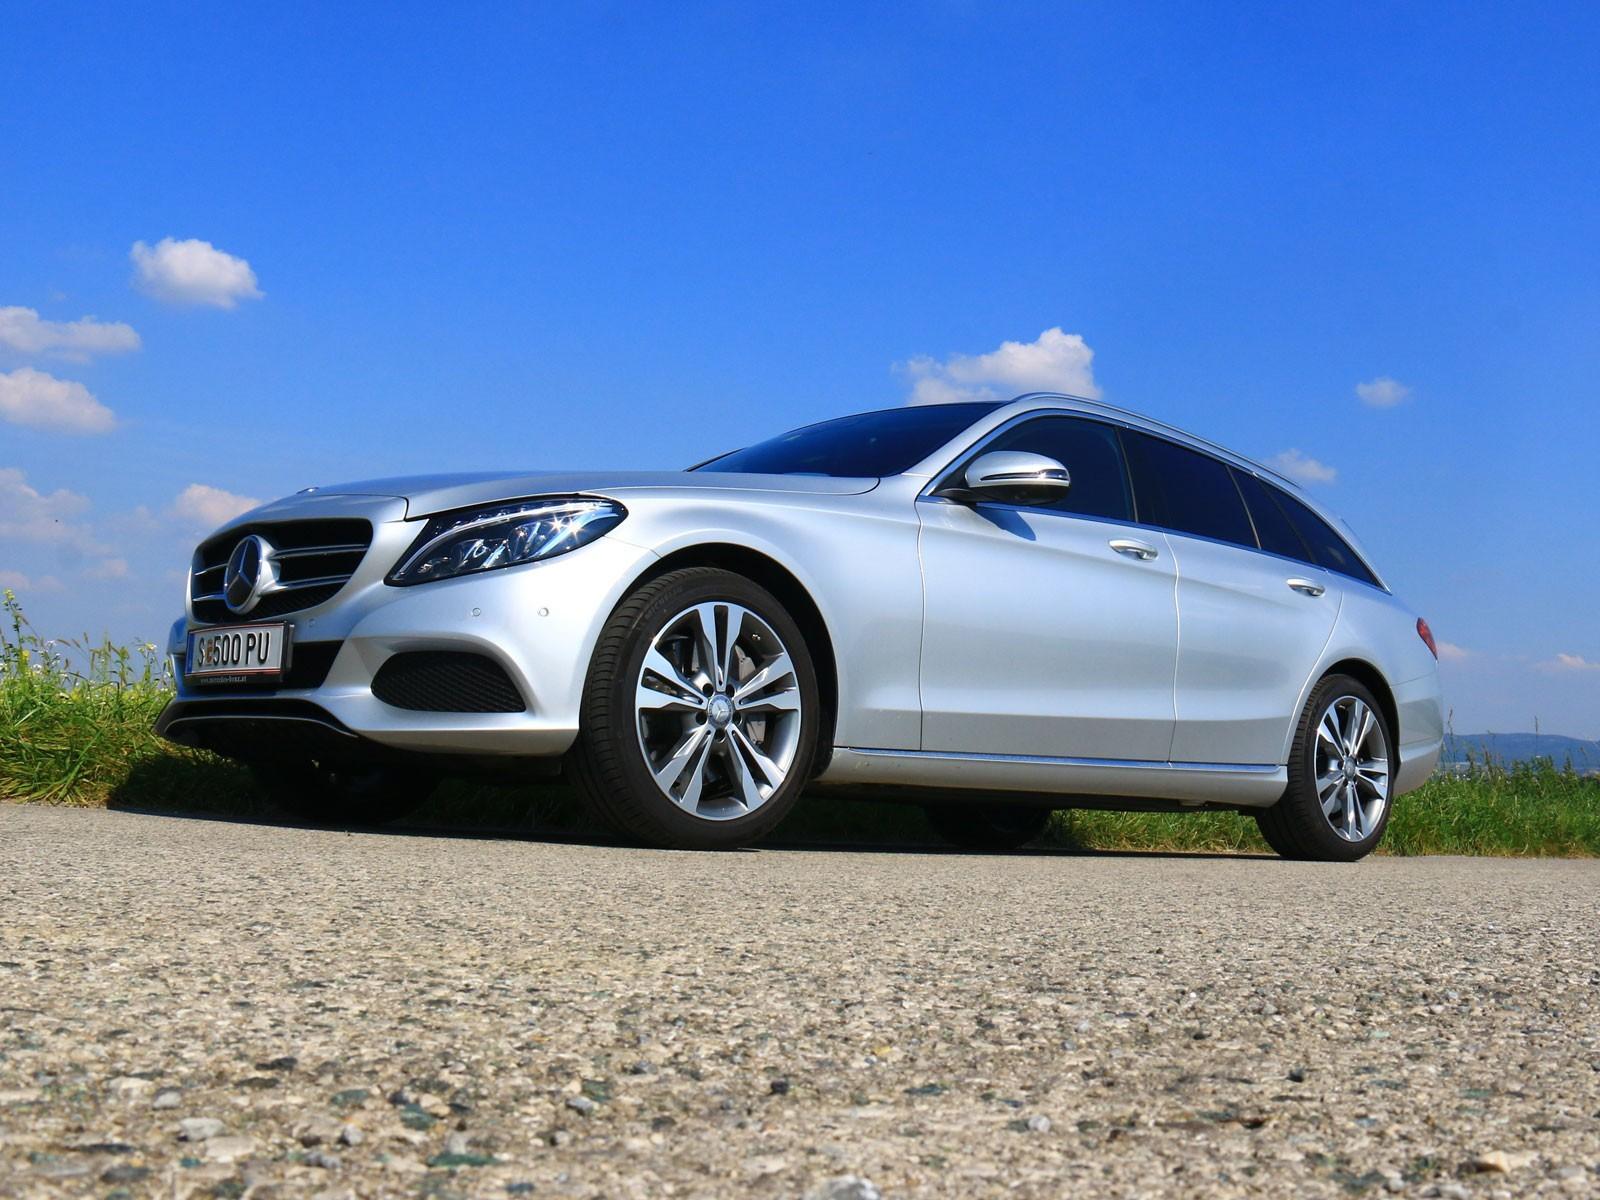 Foto Mercedes C 350 E T Modell Testbericht 015jpg Vom Artikel